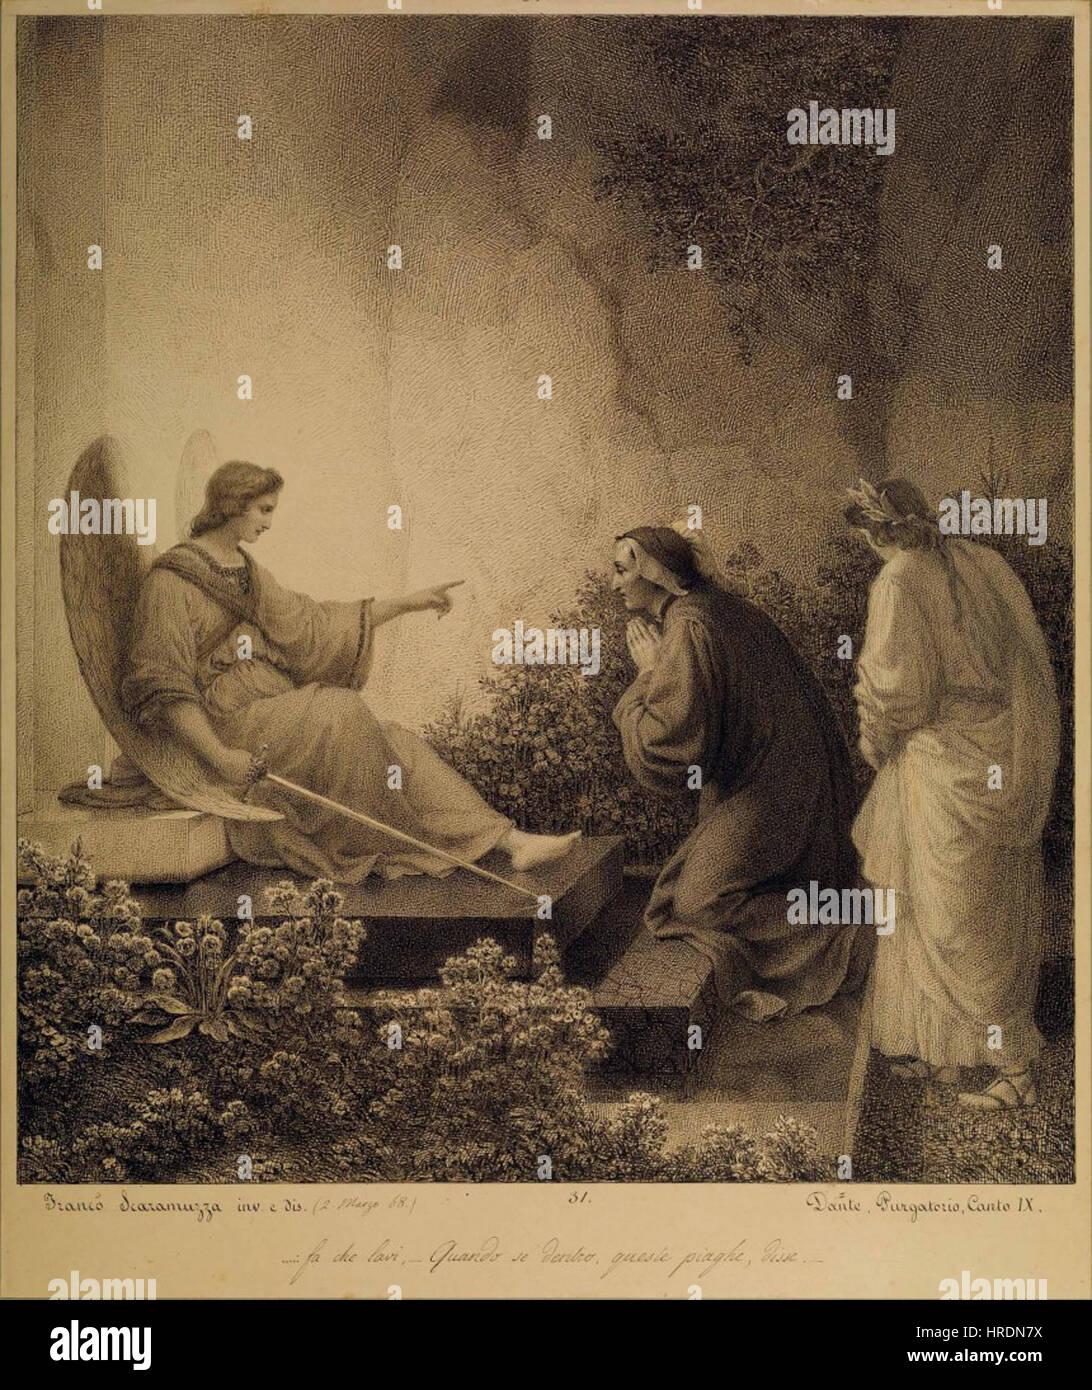 Francesco Scaramuzza - Purgatorio, Canto IX (Angelo guardiano) Stock Photo